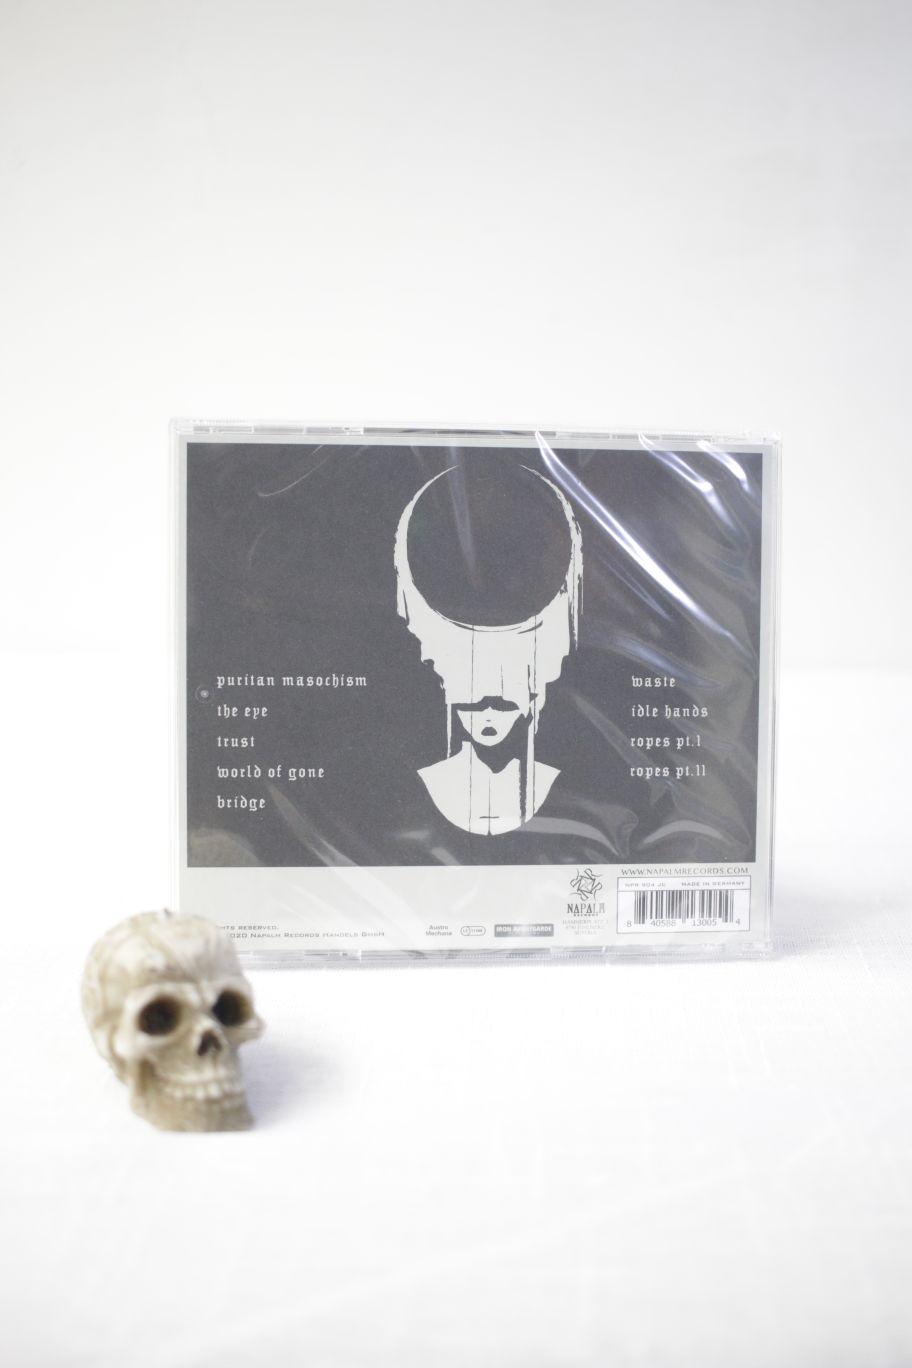 CD KONVENT PURITAN MASOCHISM